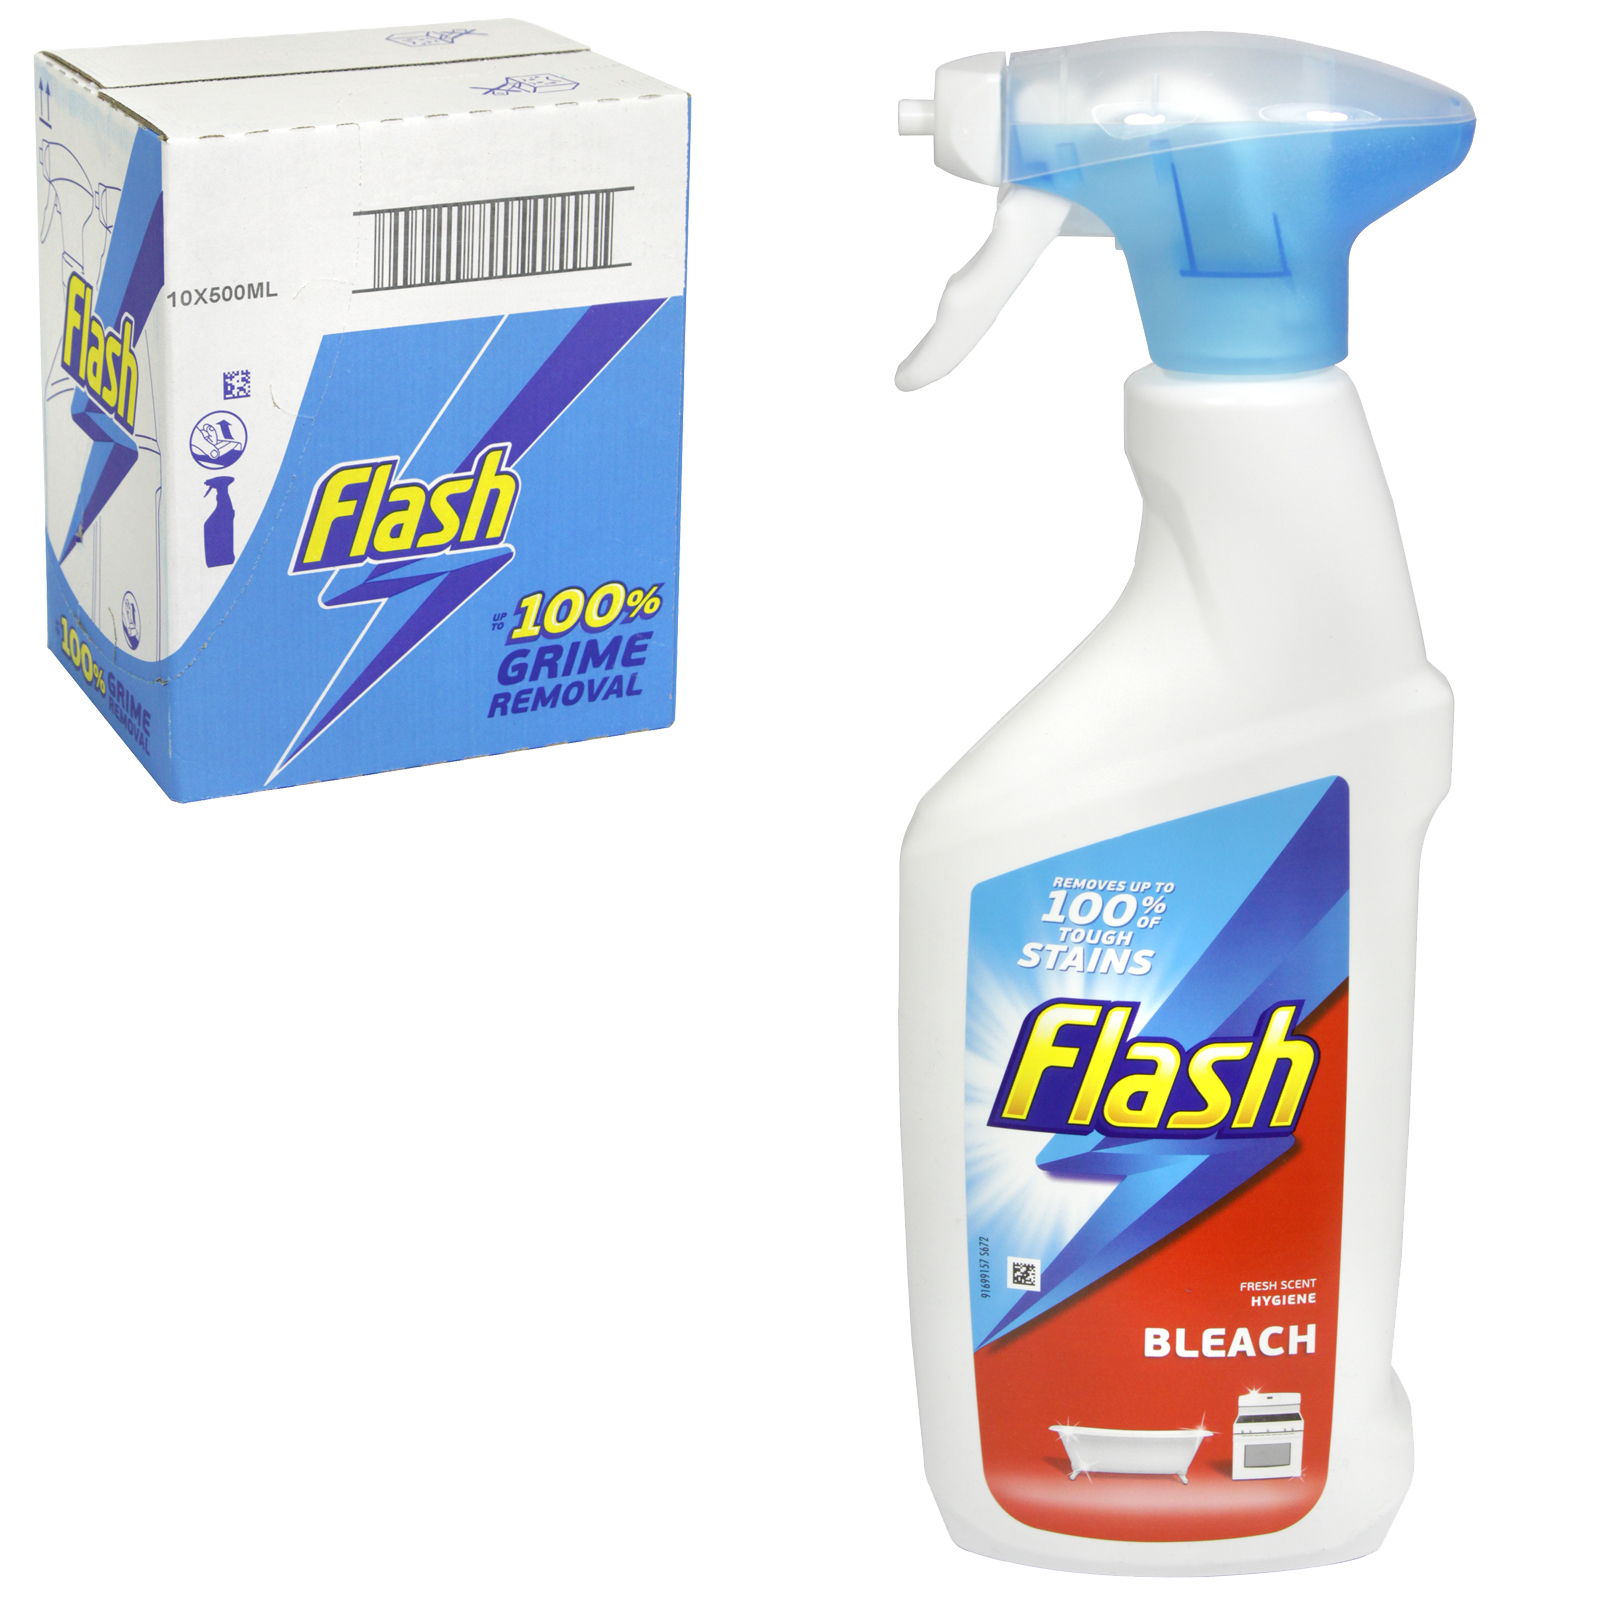 FLASH SPRAY 500ML WITH BLEACH PM £1.99 X 6